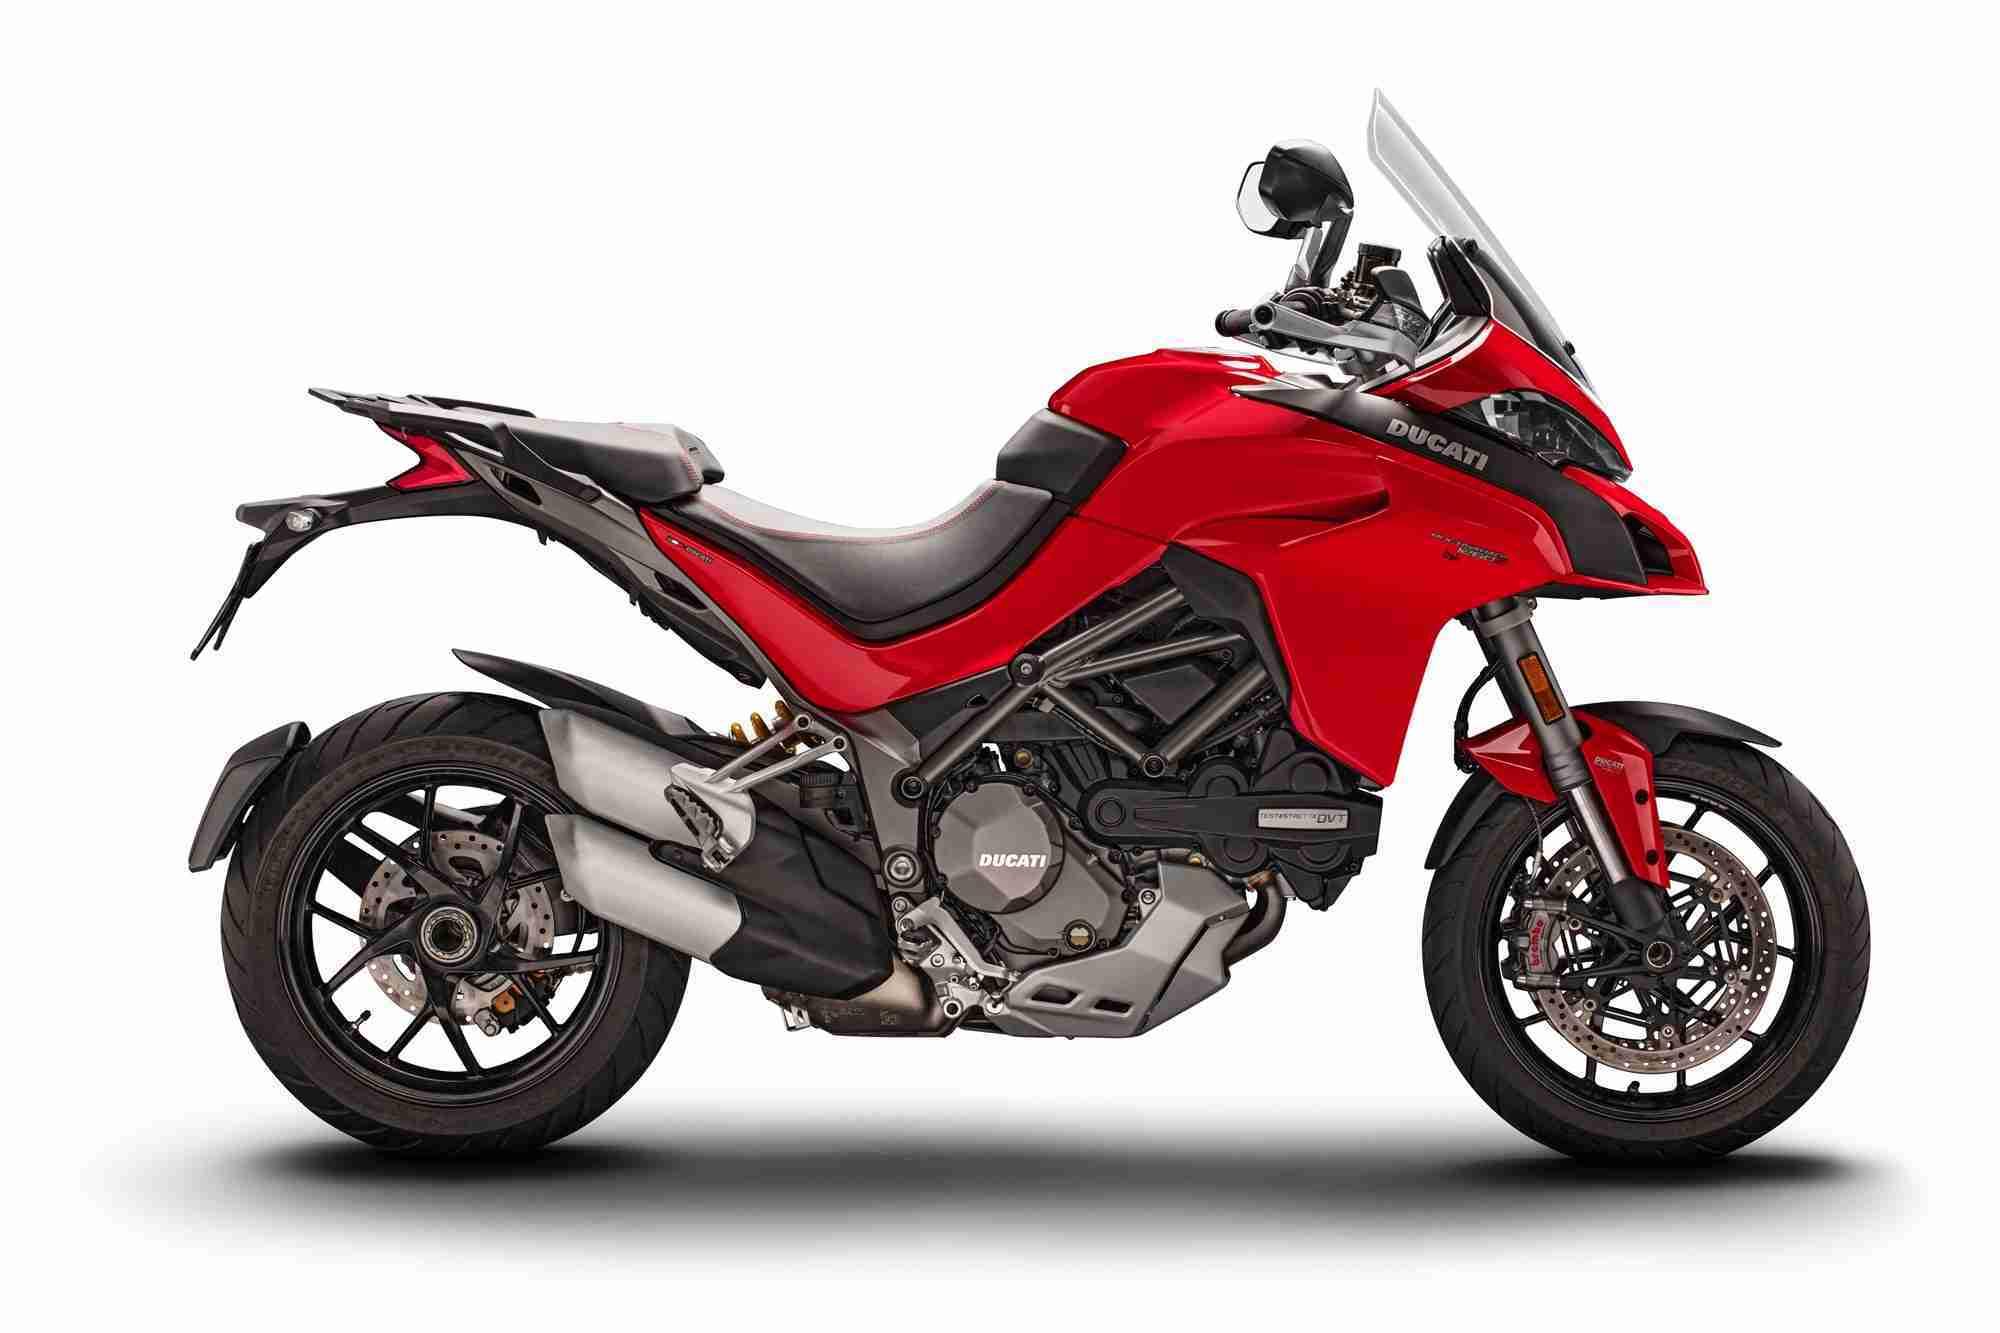 2018 Ducati Multistrada 1260 and Multistrada 1260 S images